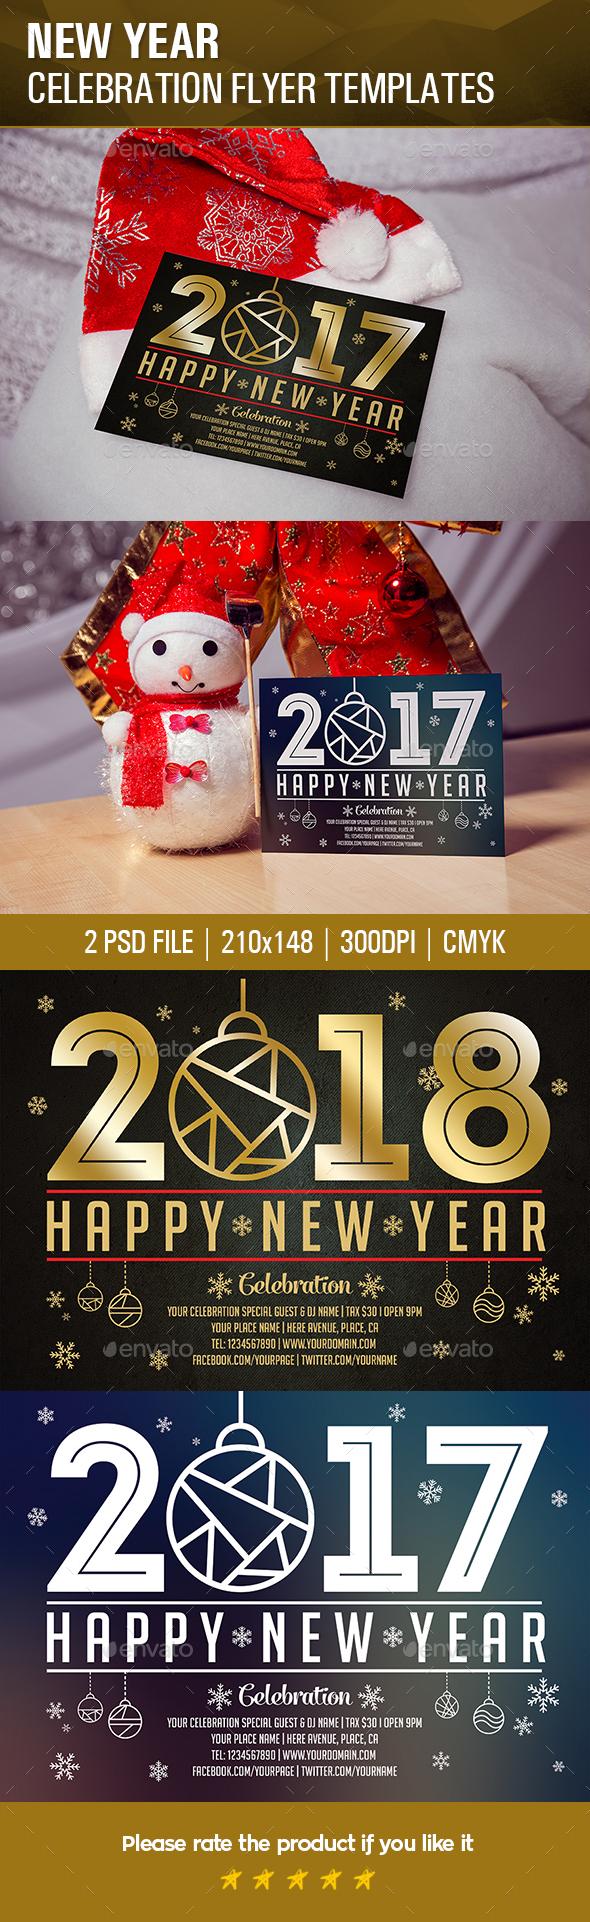 New Year Celebration Flyer Templates - Events Flyers